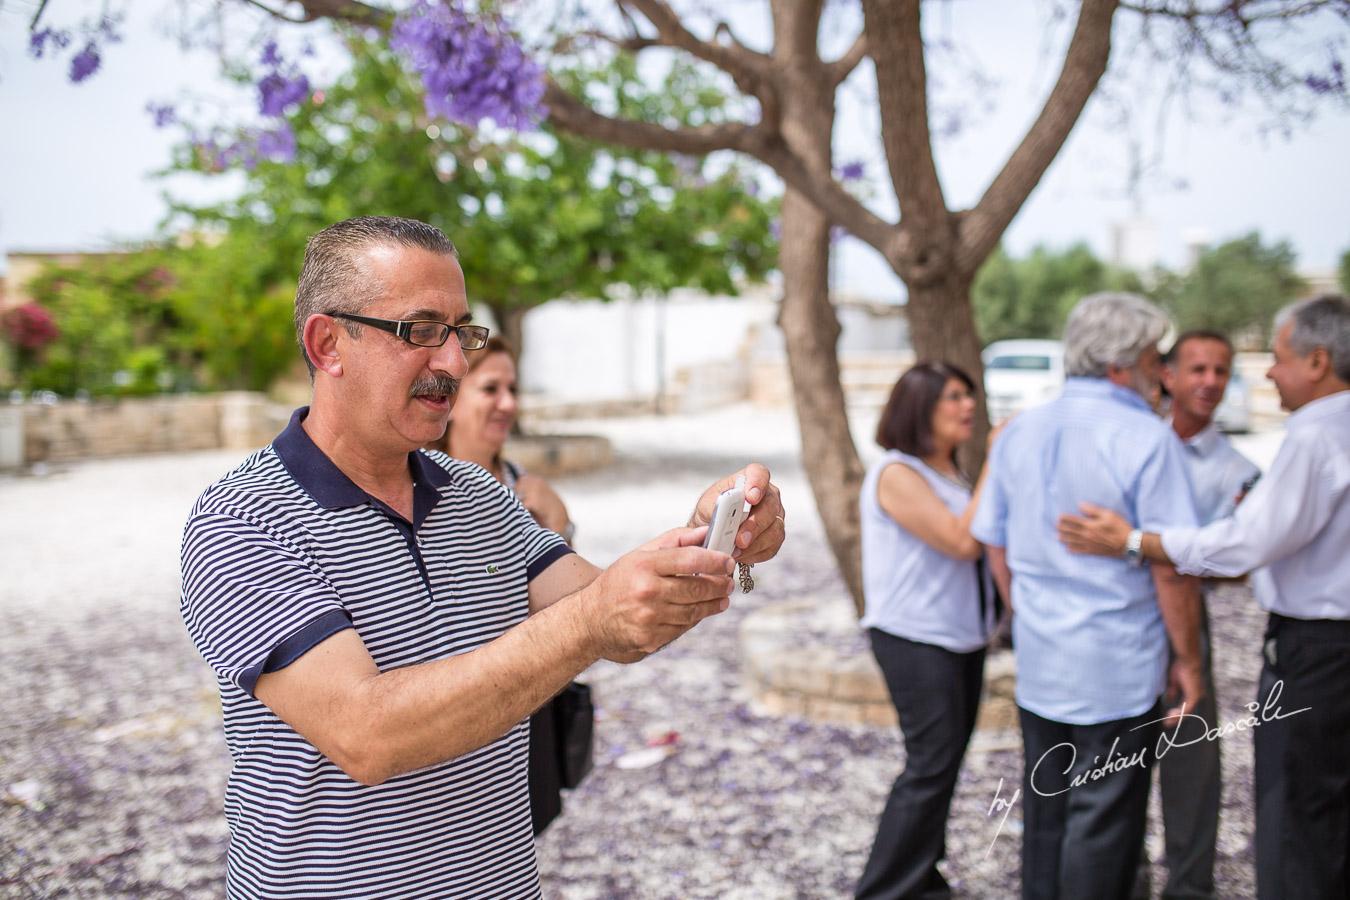 Joyous Christening in Limassol - 15